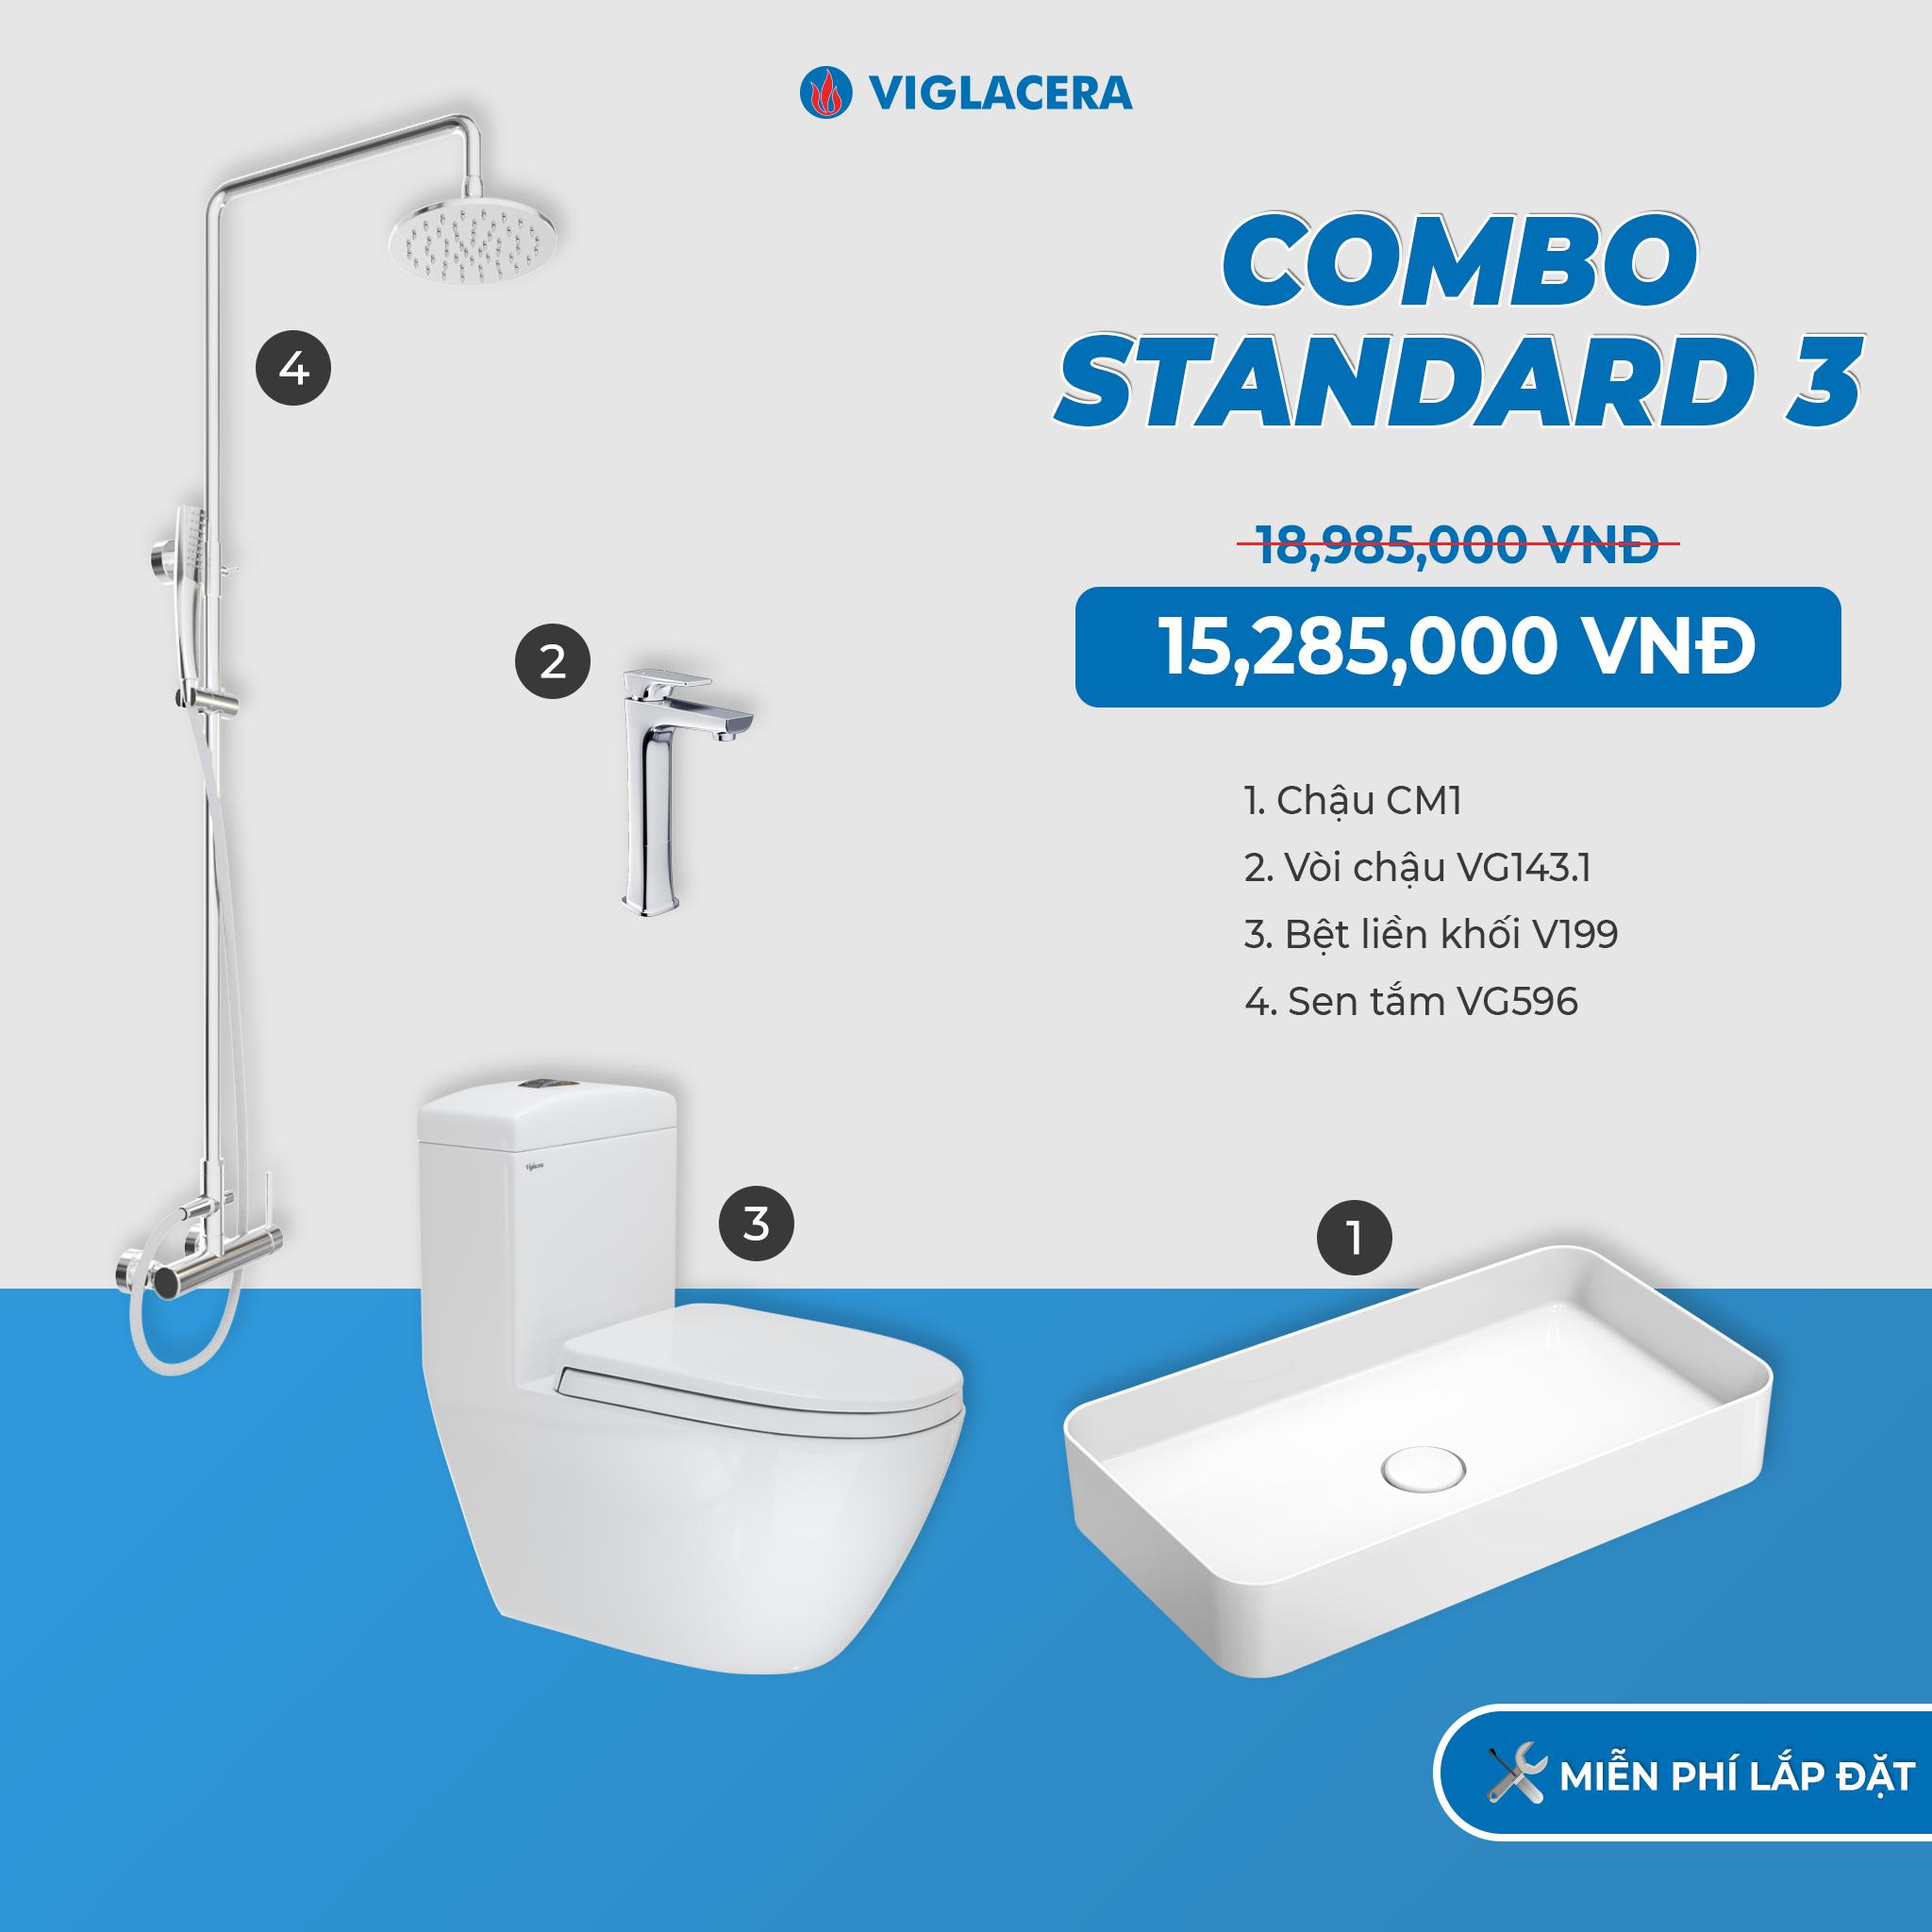 Combo Viglacera Standard 3